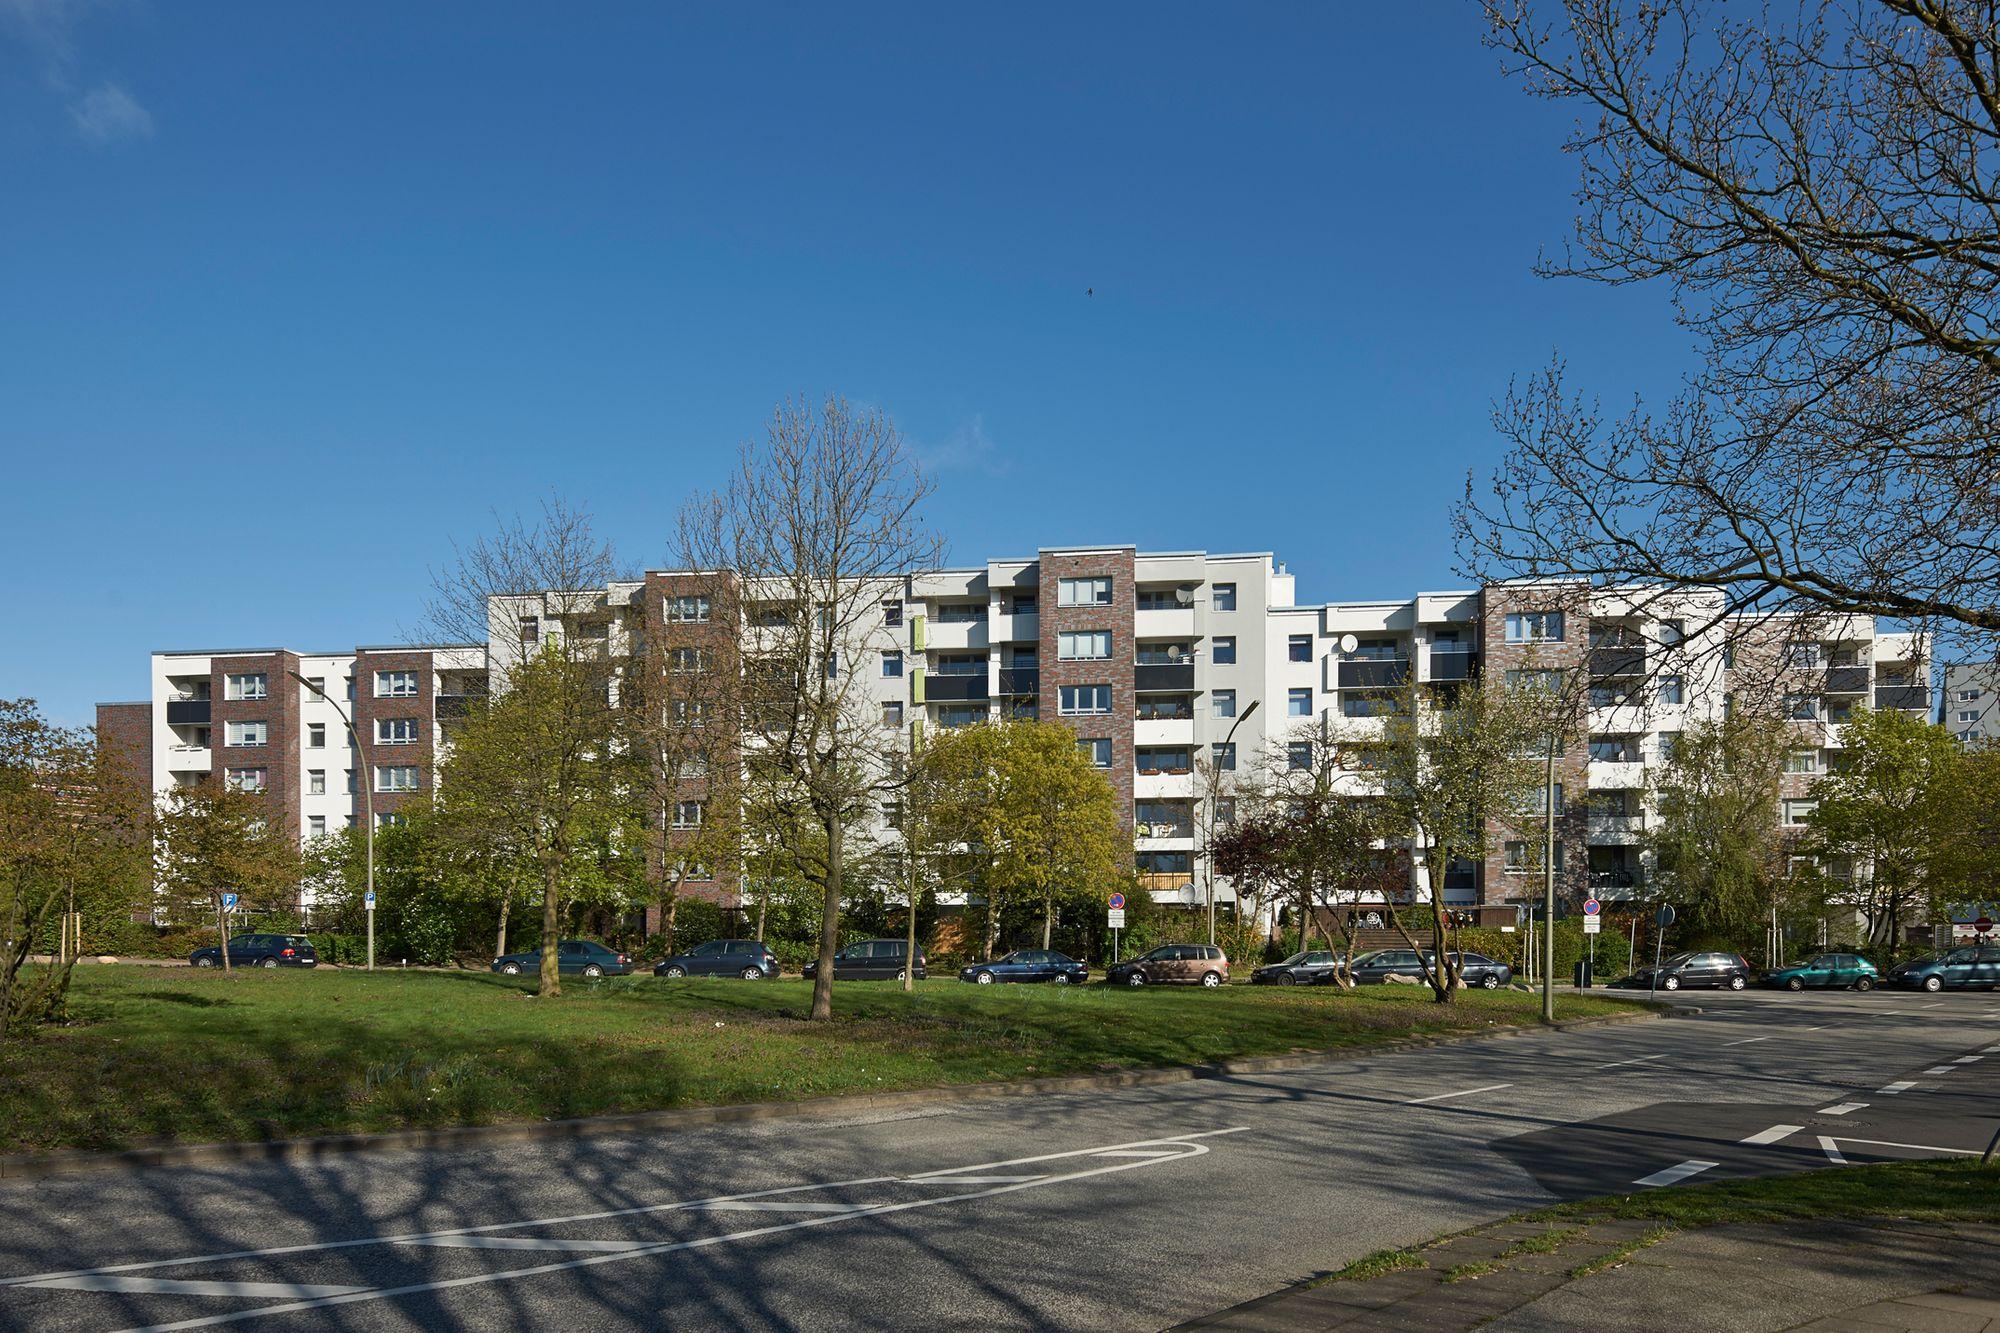 Krieter Straße